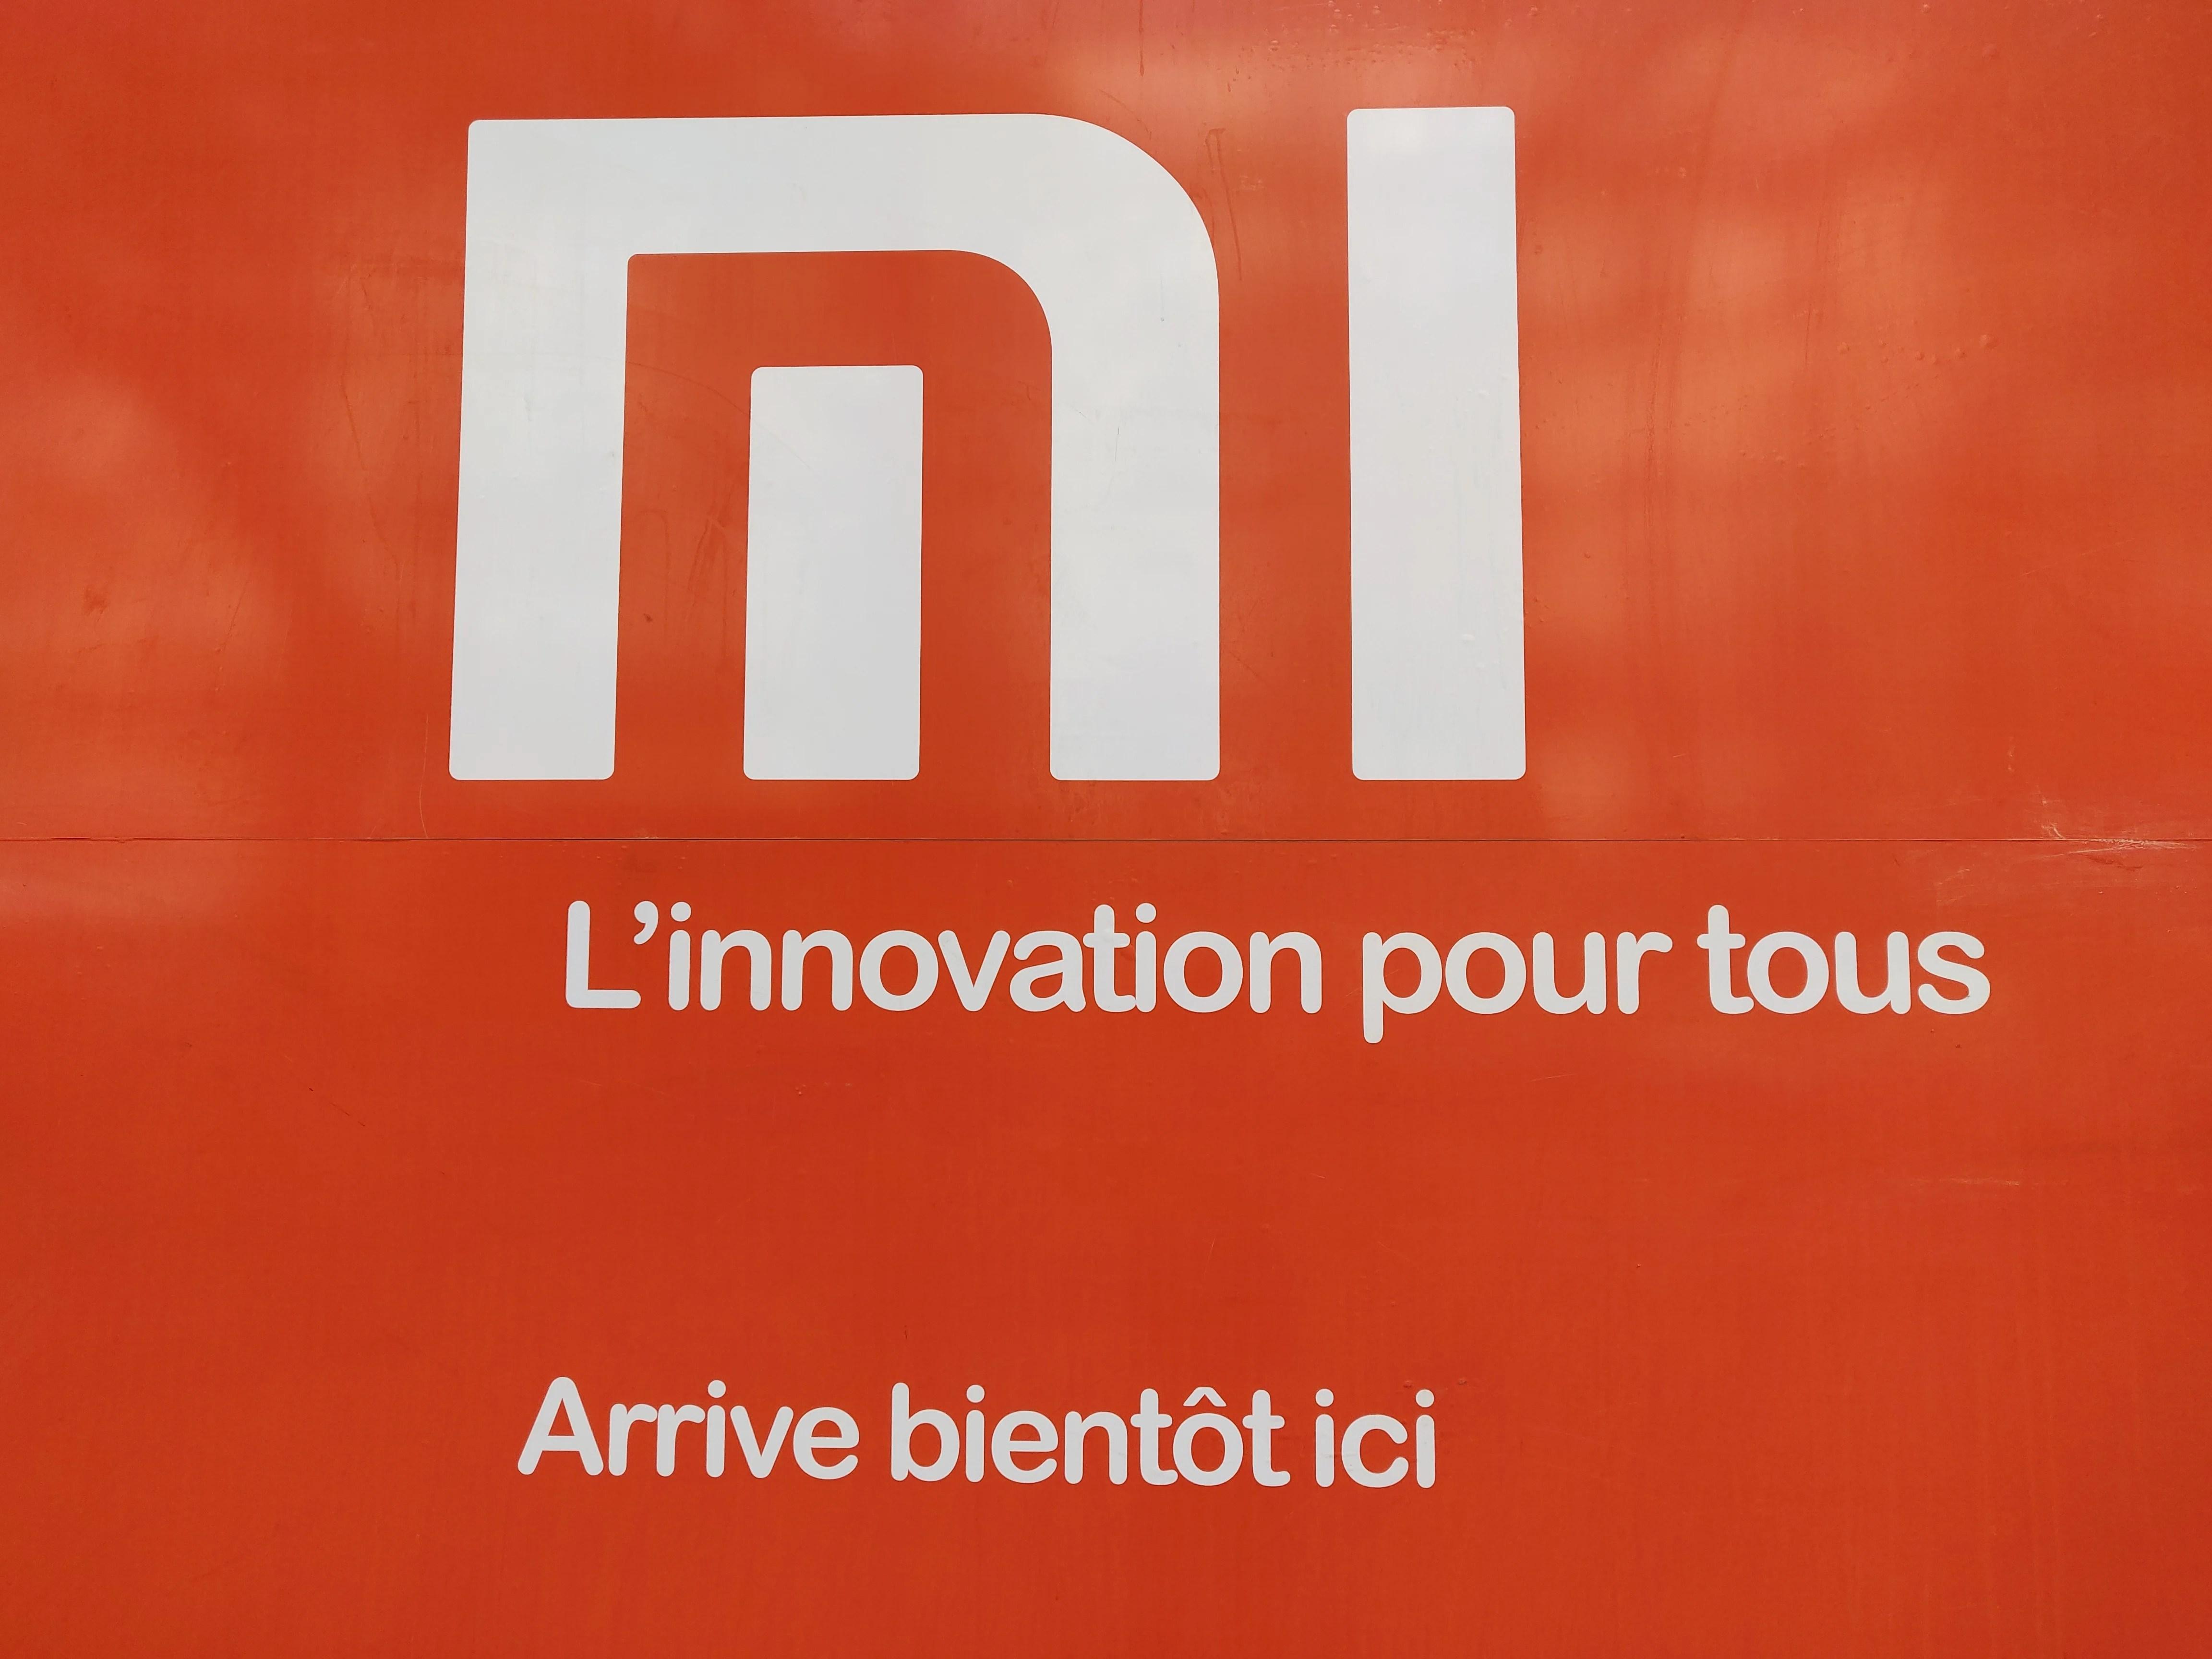 Xiaomi Mi Store : la folle histoire de la 3e boutique inconnue au bataillon